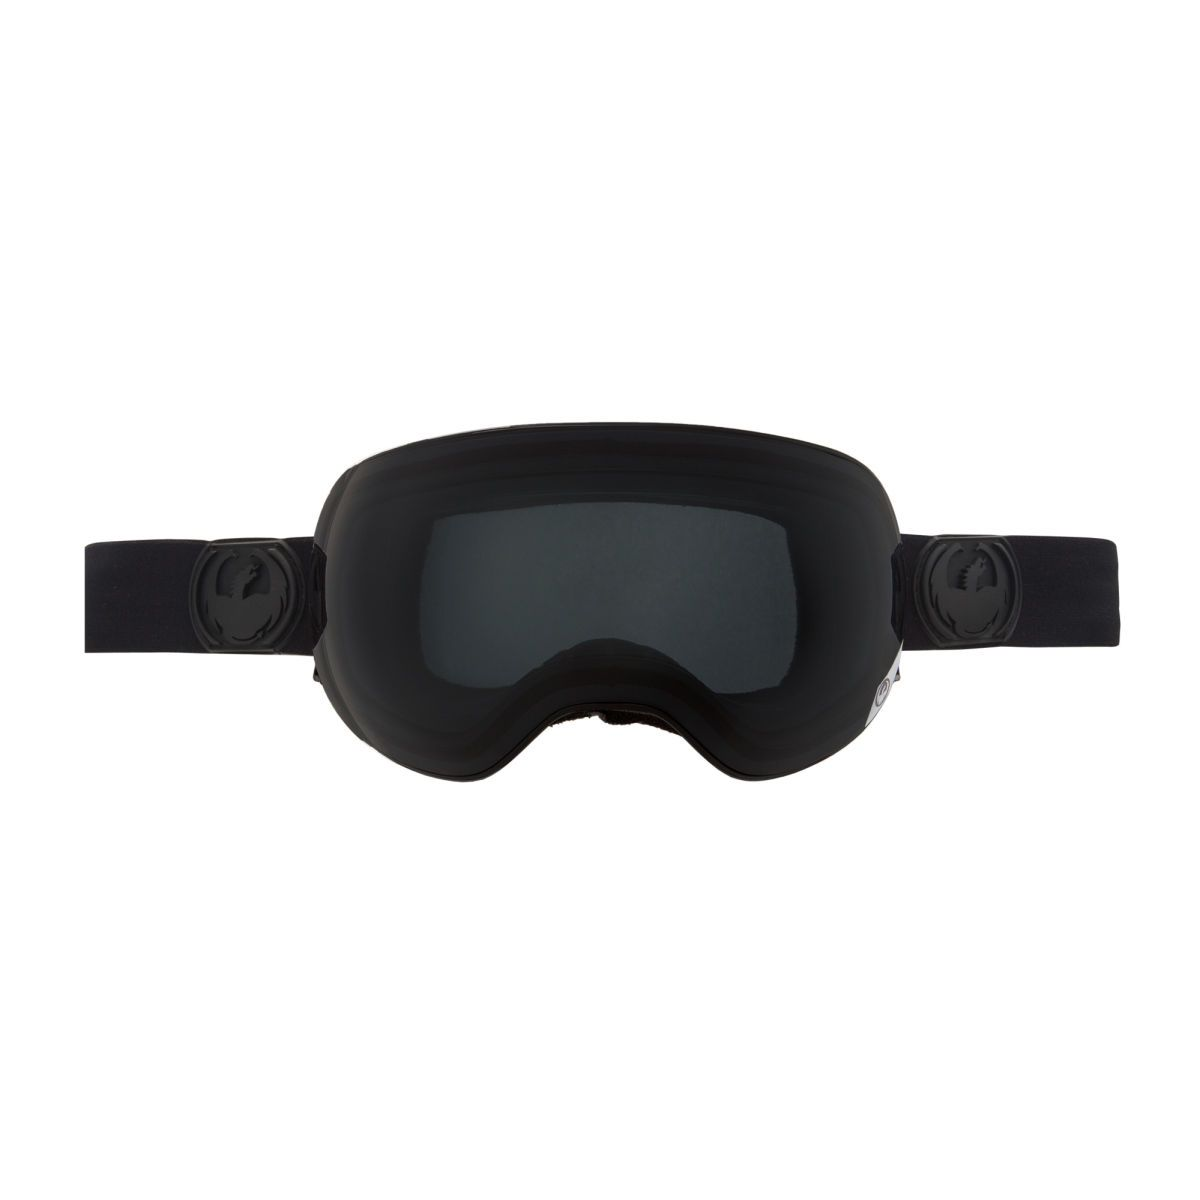 Dragon X2 Goggles, Knightrider - Dark Smoke